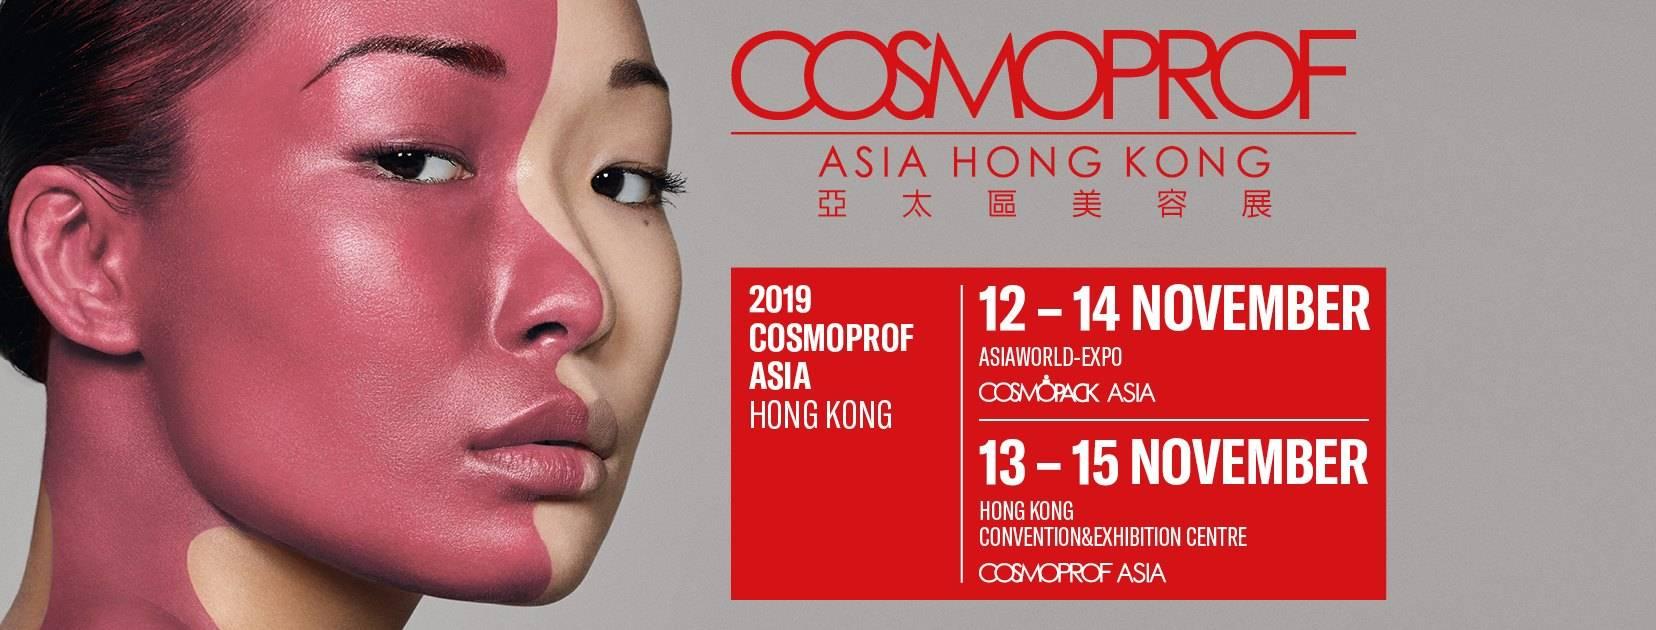 2019CosmoprofAsia